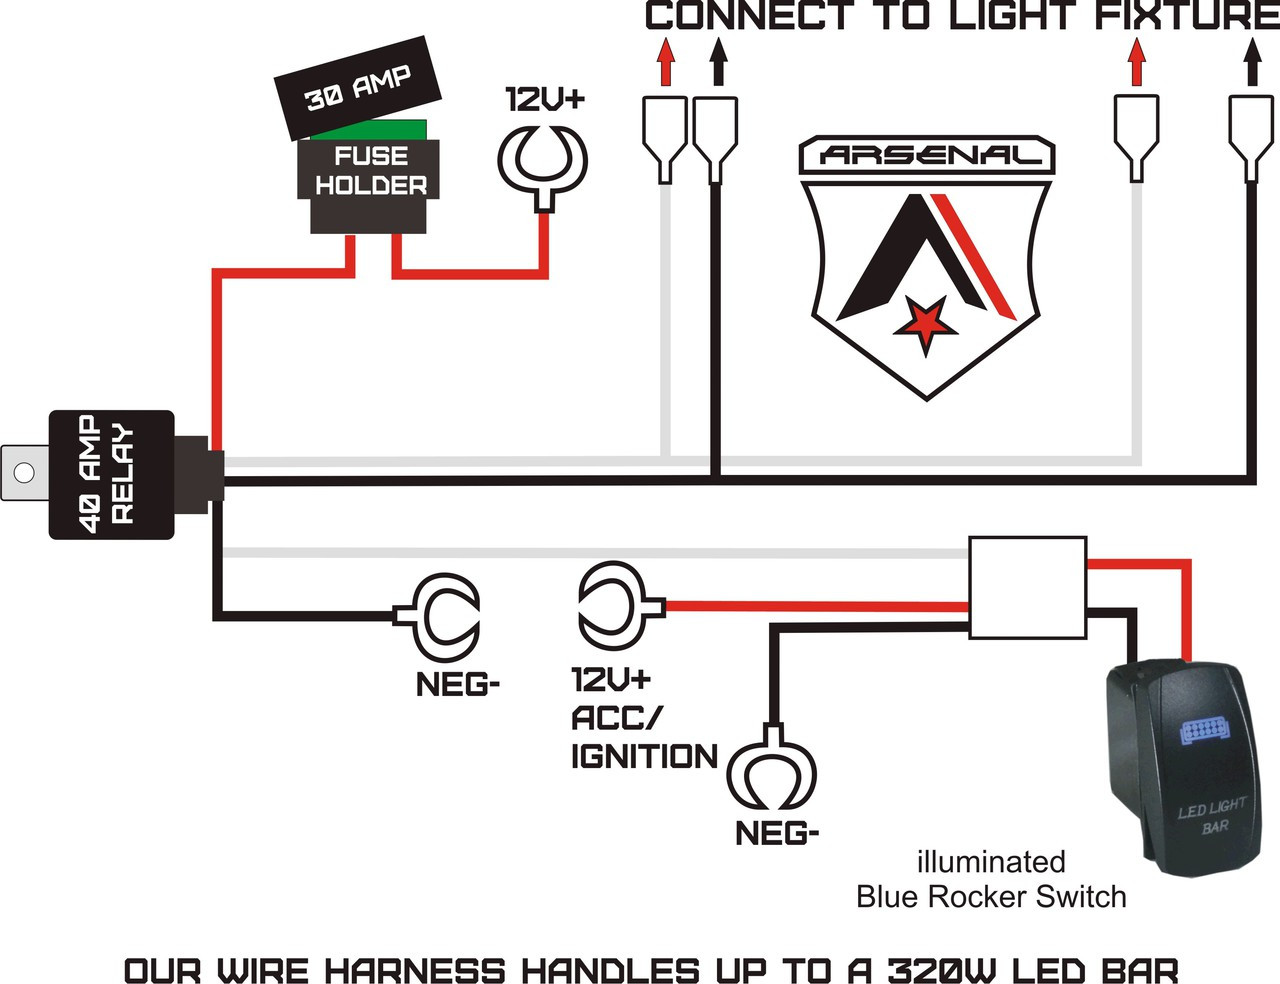 medium resolution of  1 40 inch led cree light bar by arsenal offroad 228w spot flood combo beam offroad trucks 4x4 jeep trucks utv suv 4x4 polaris razor 1000 tractor raptor